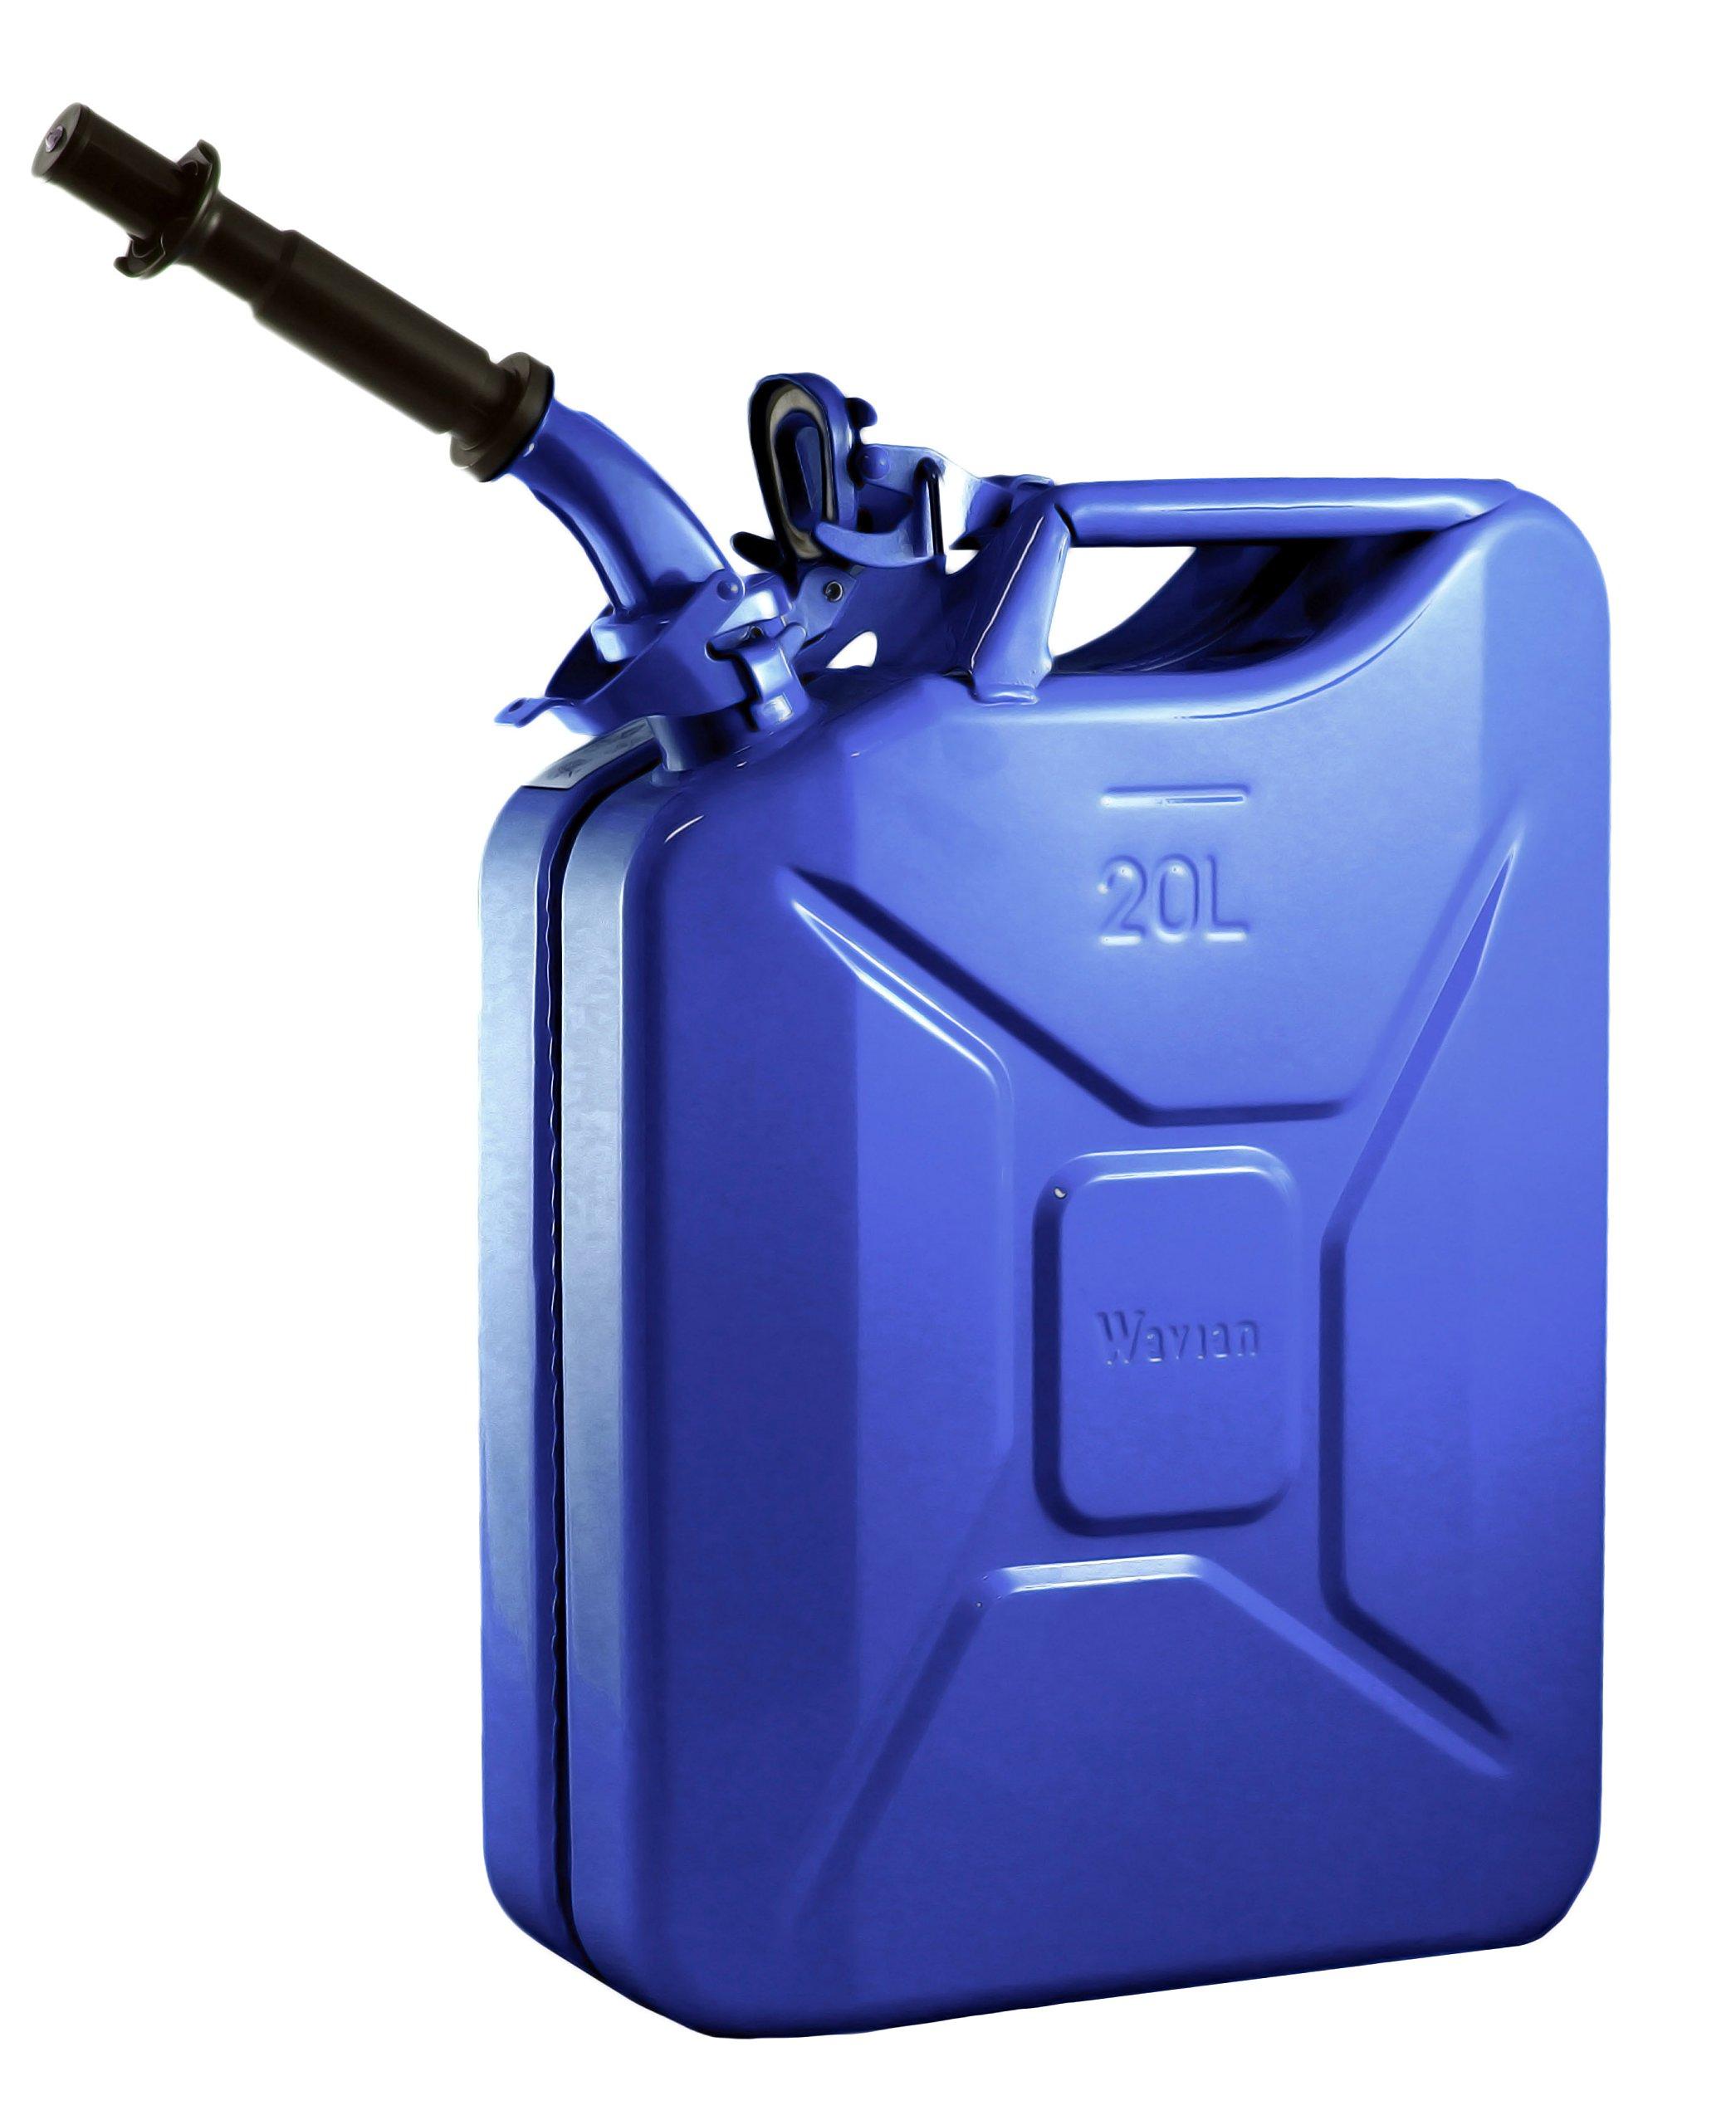 Wavian USA JC0020BLVS Authentic NATO Jerry Fuel Can and Spout System Blue (20 Litre)